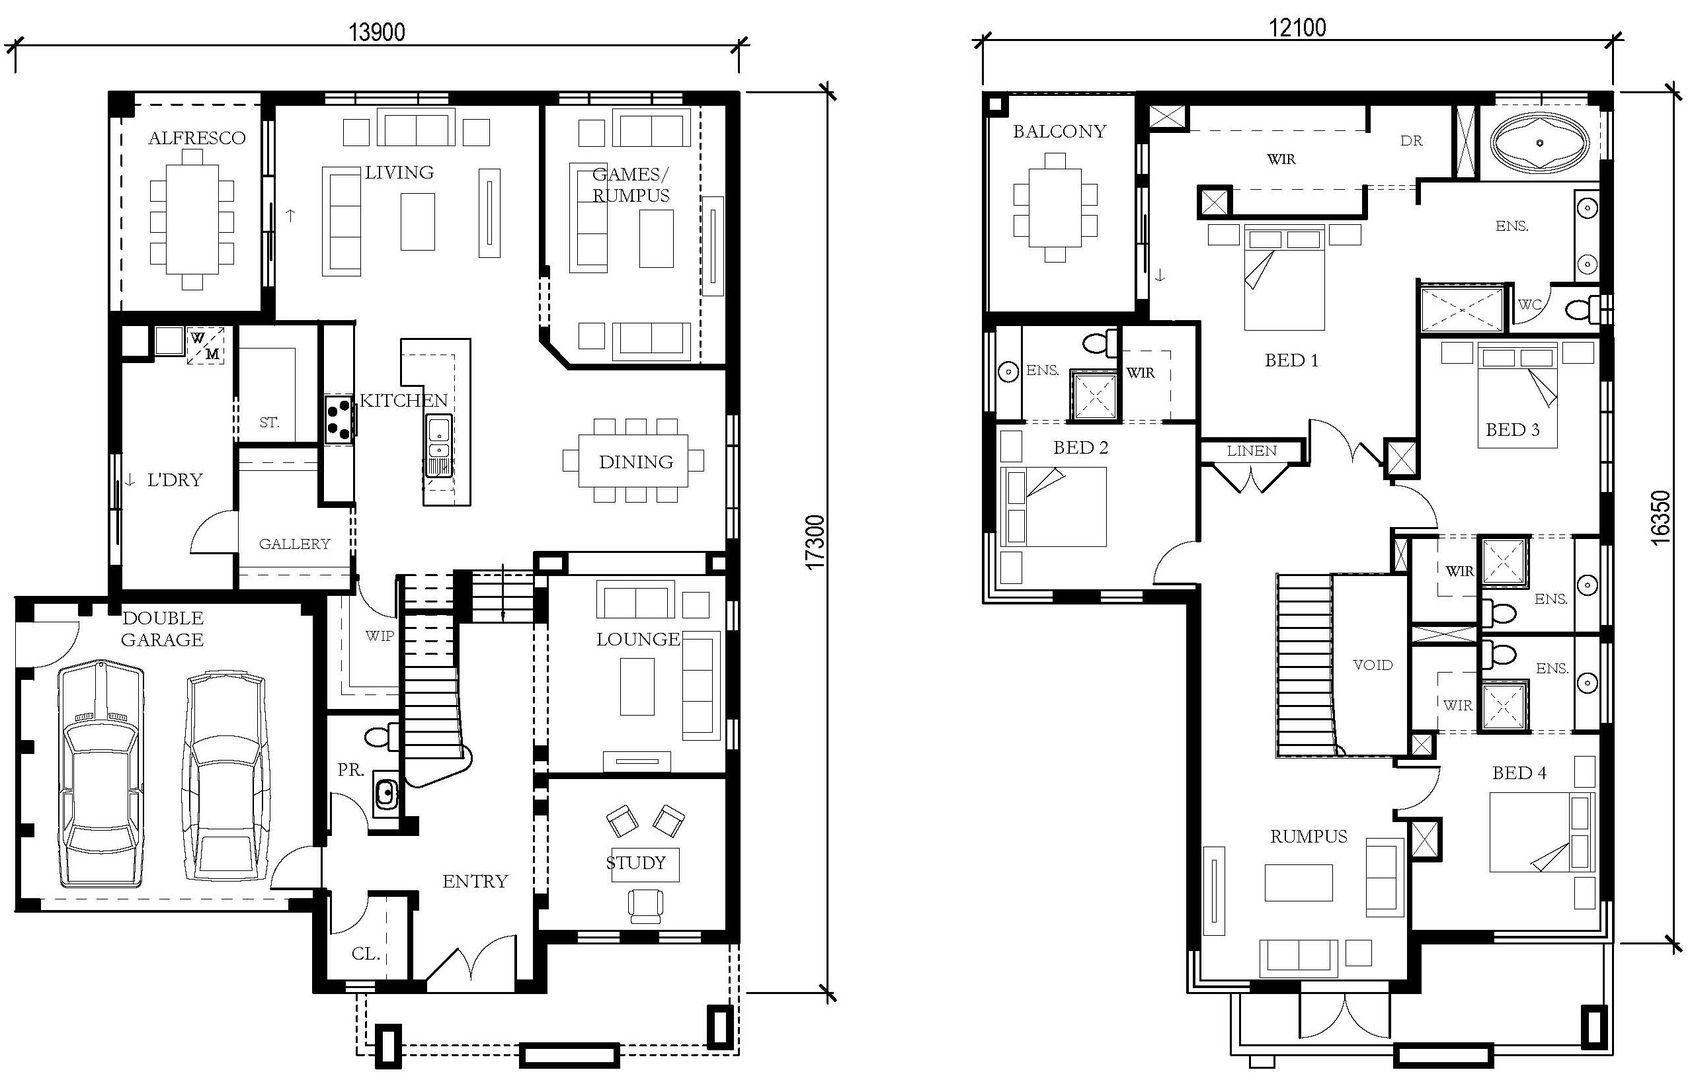 Lot 113 Banyan Avenue, Baulkham Hills NSW 2153, Image 1